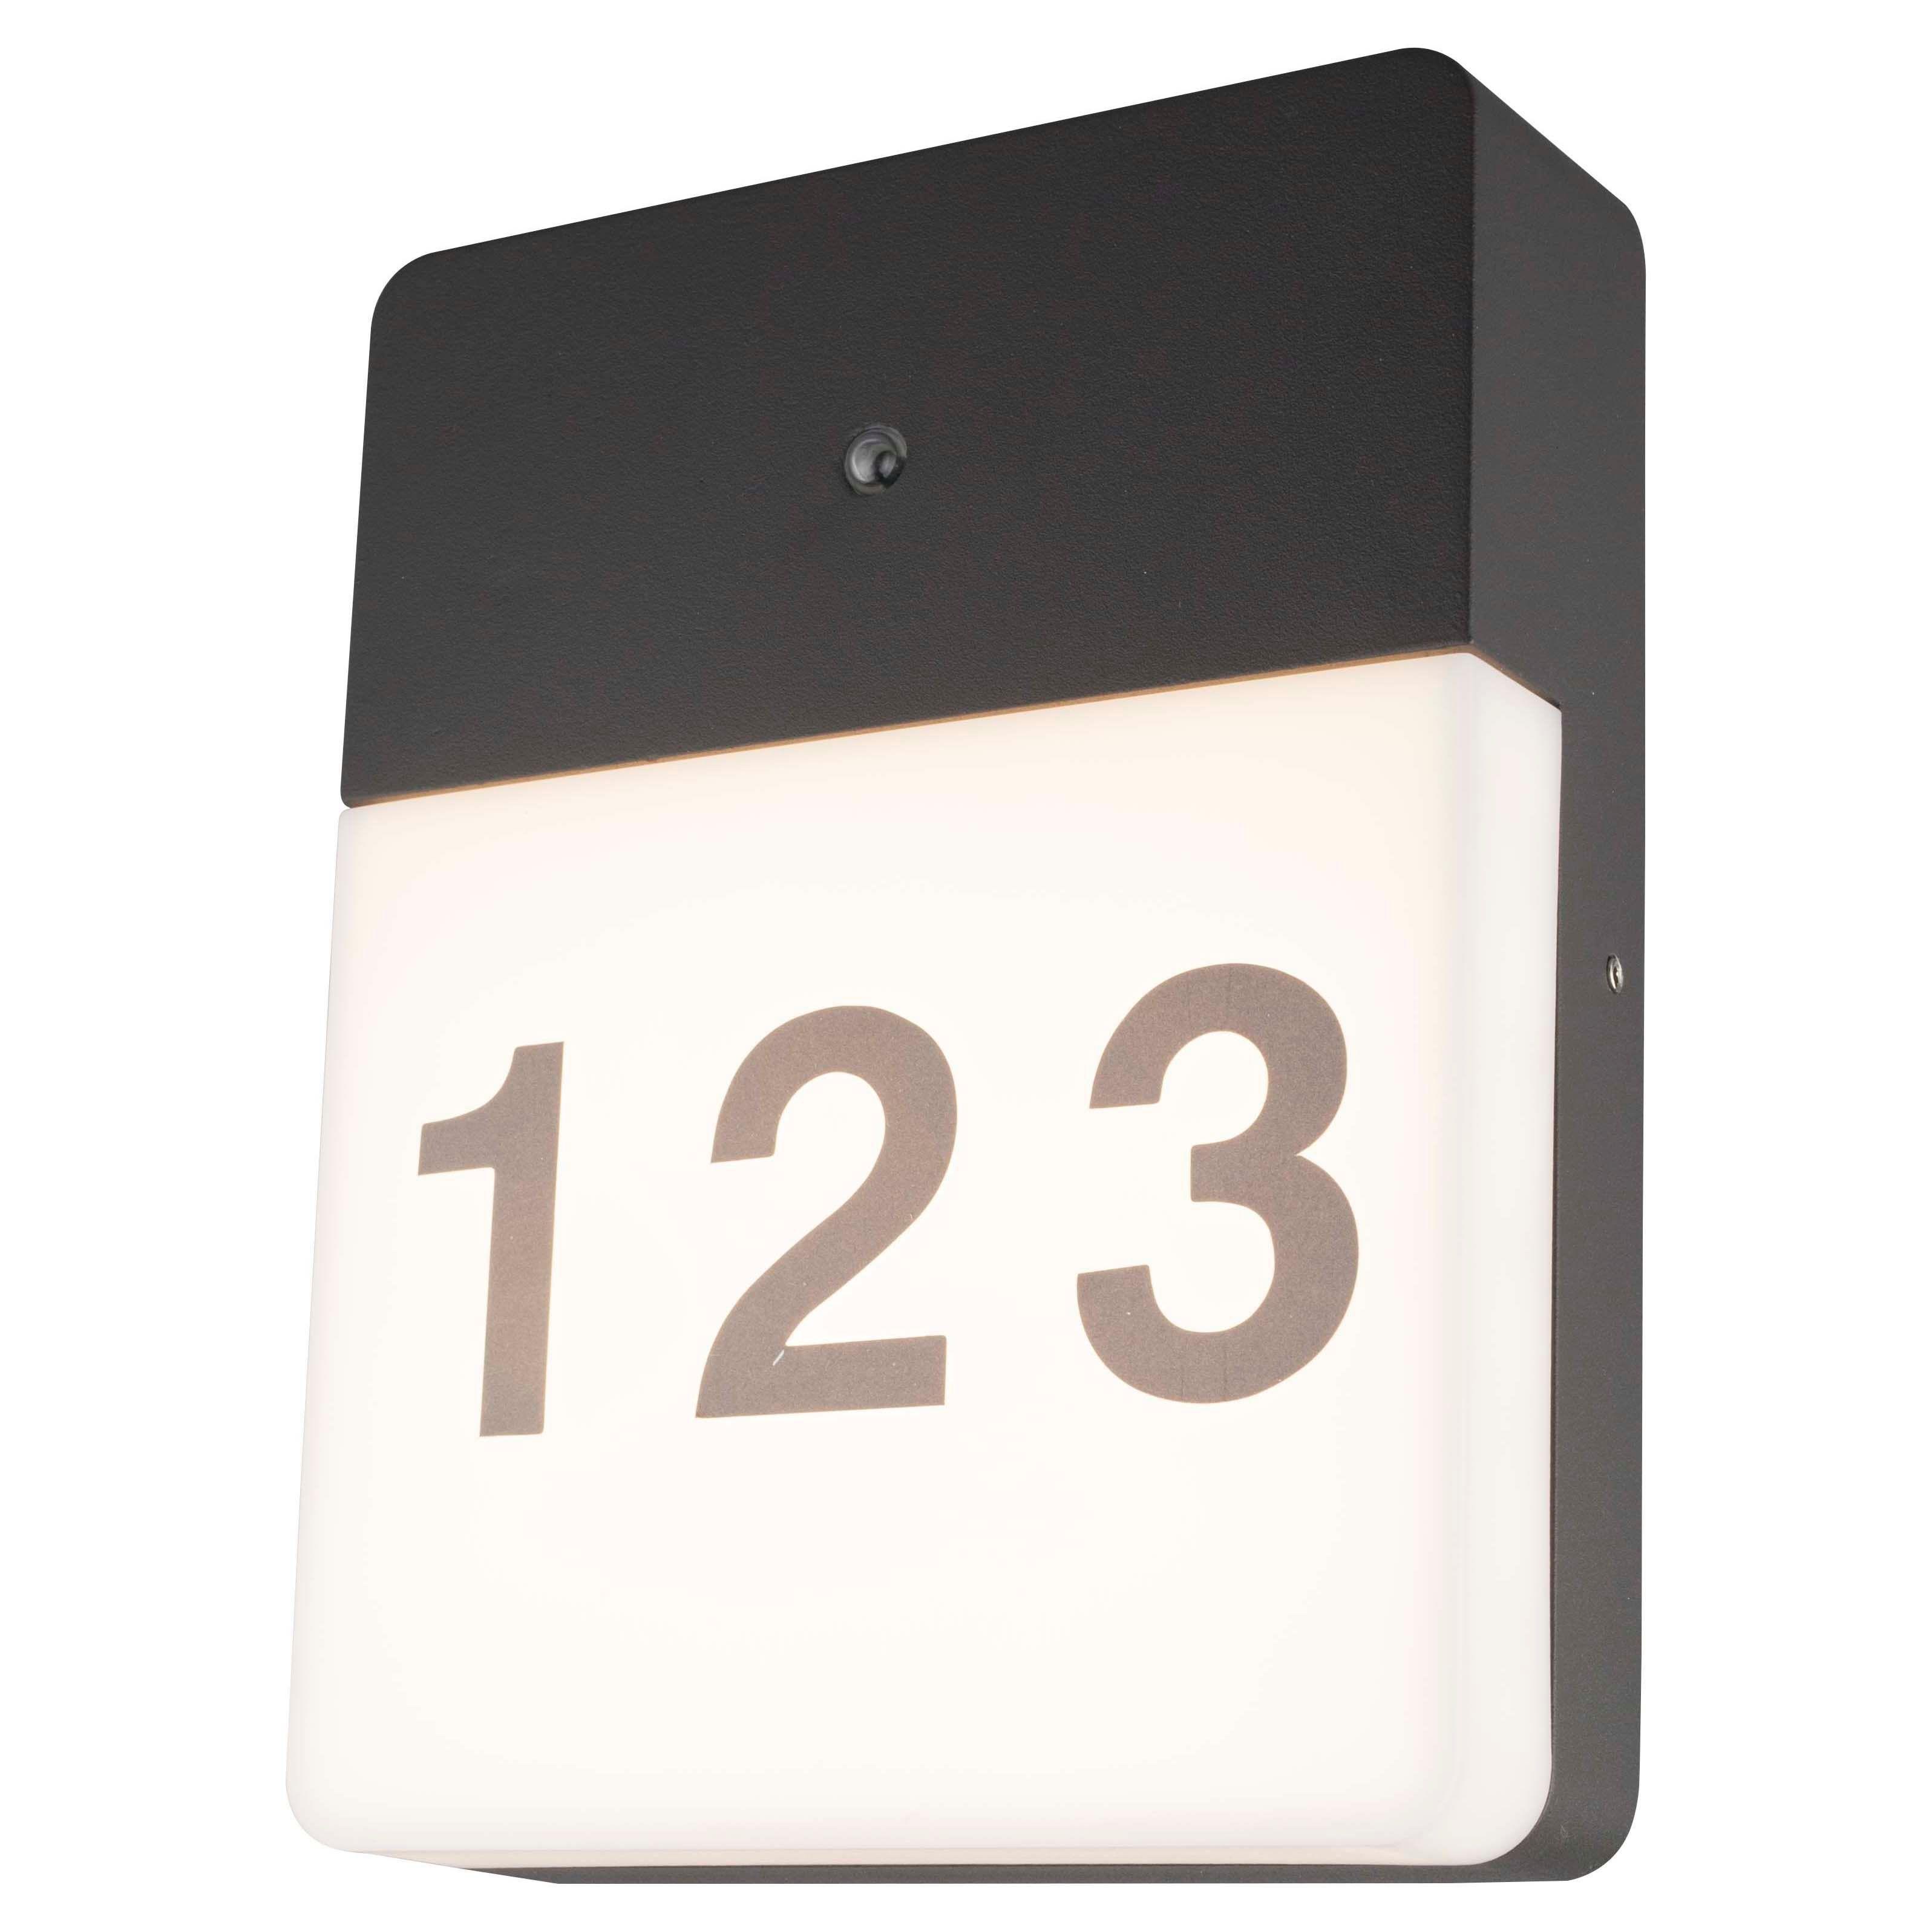 Blooma Burnet Grey Mains Powered External Door Number Wall Light